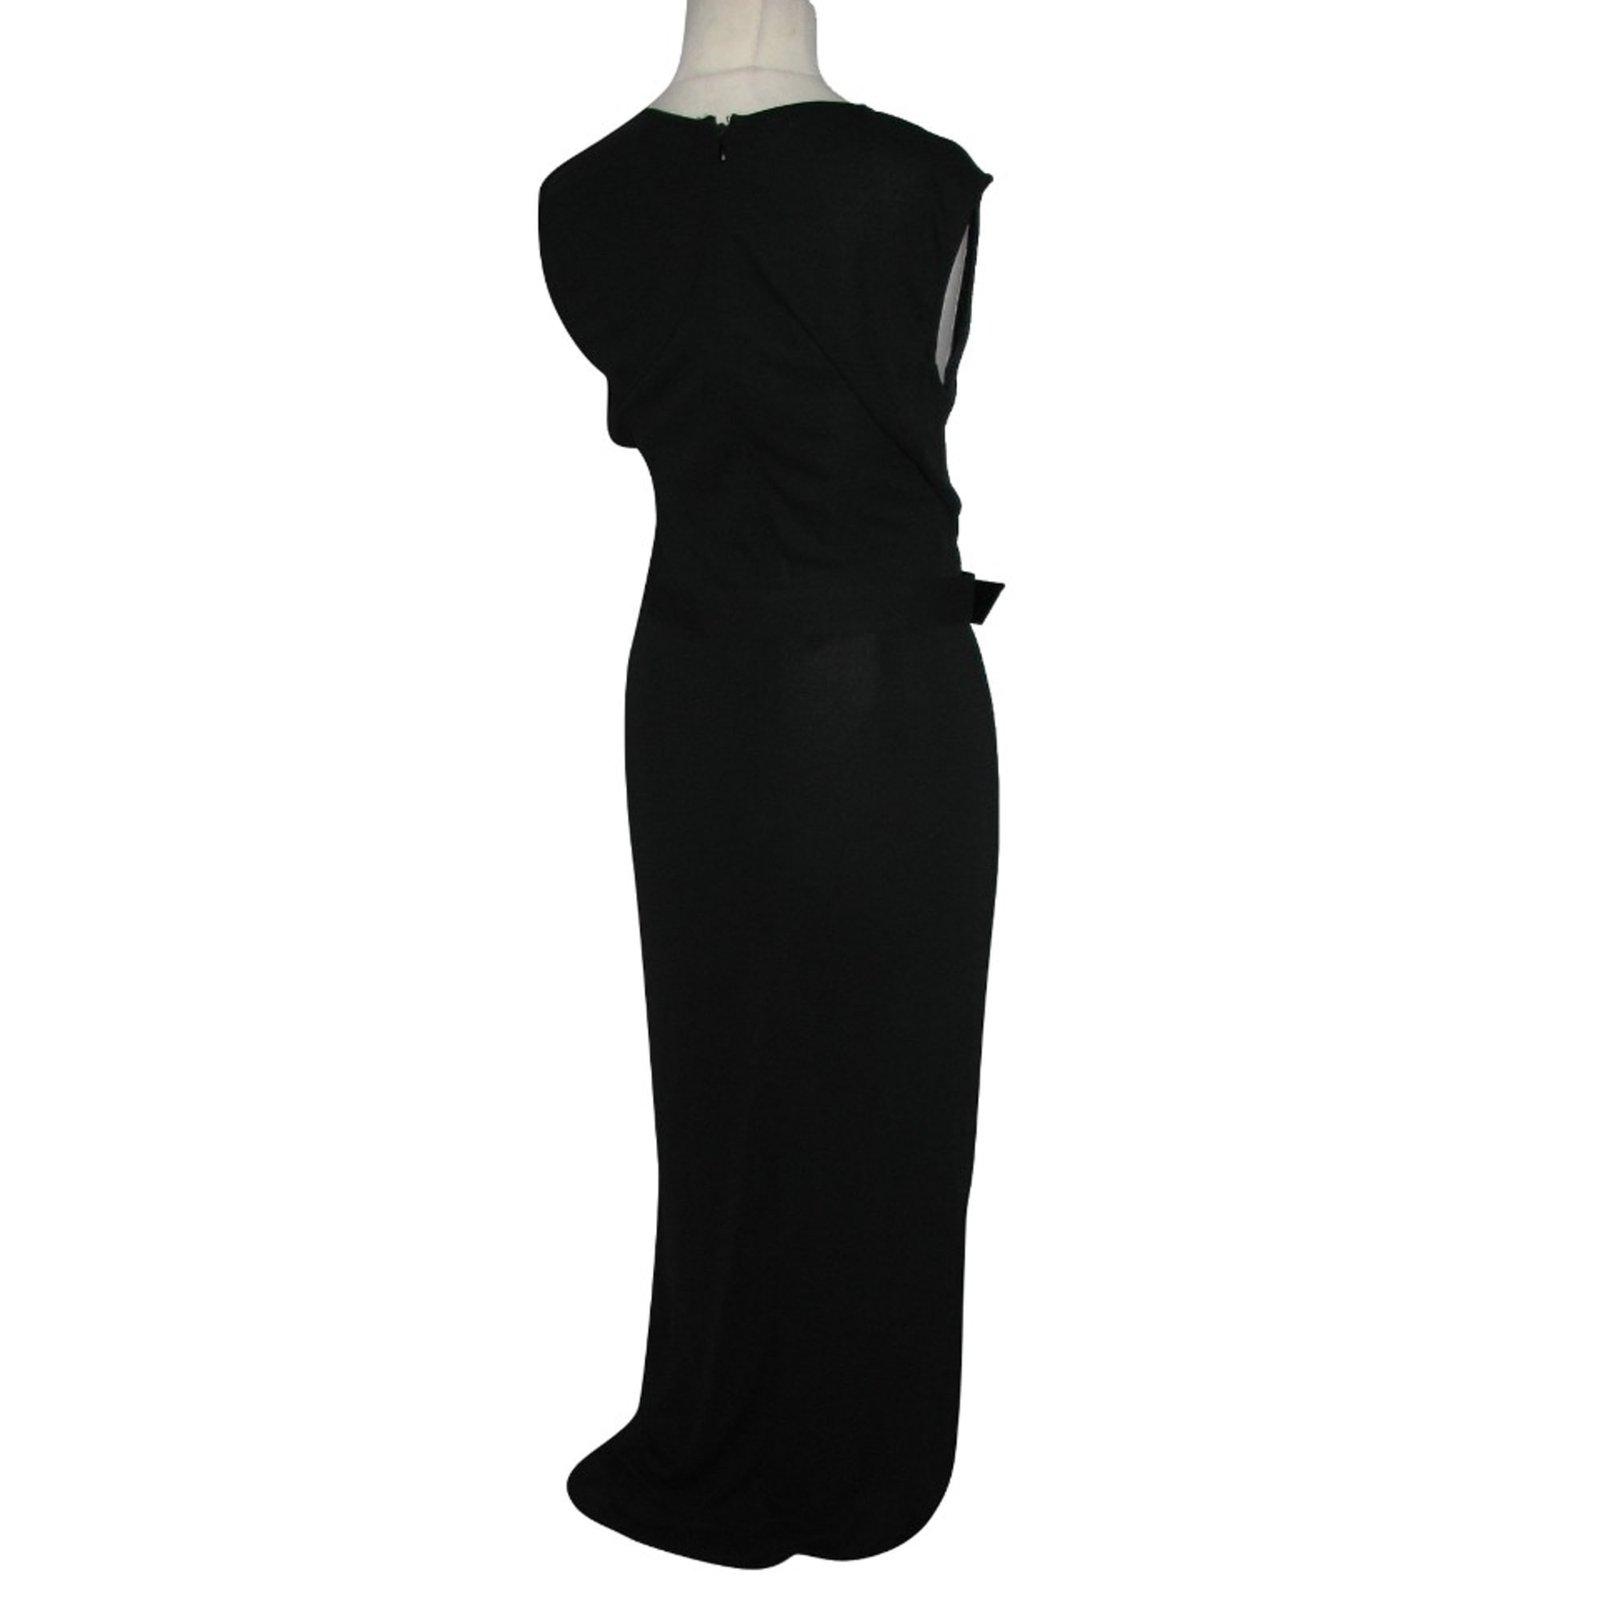 e03b64ba2f6 Max Mara Long black dress with belt Dresses Other Black ref.98495 - Joli  Closet